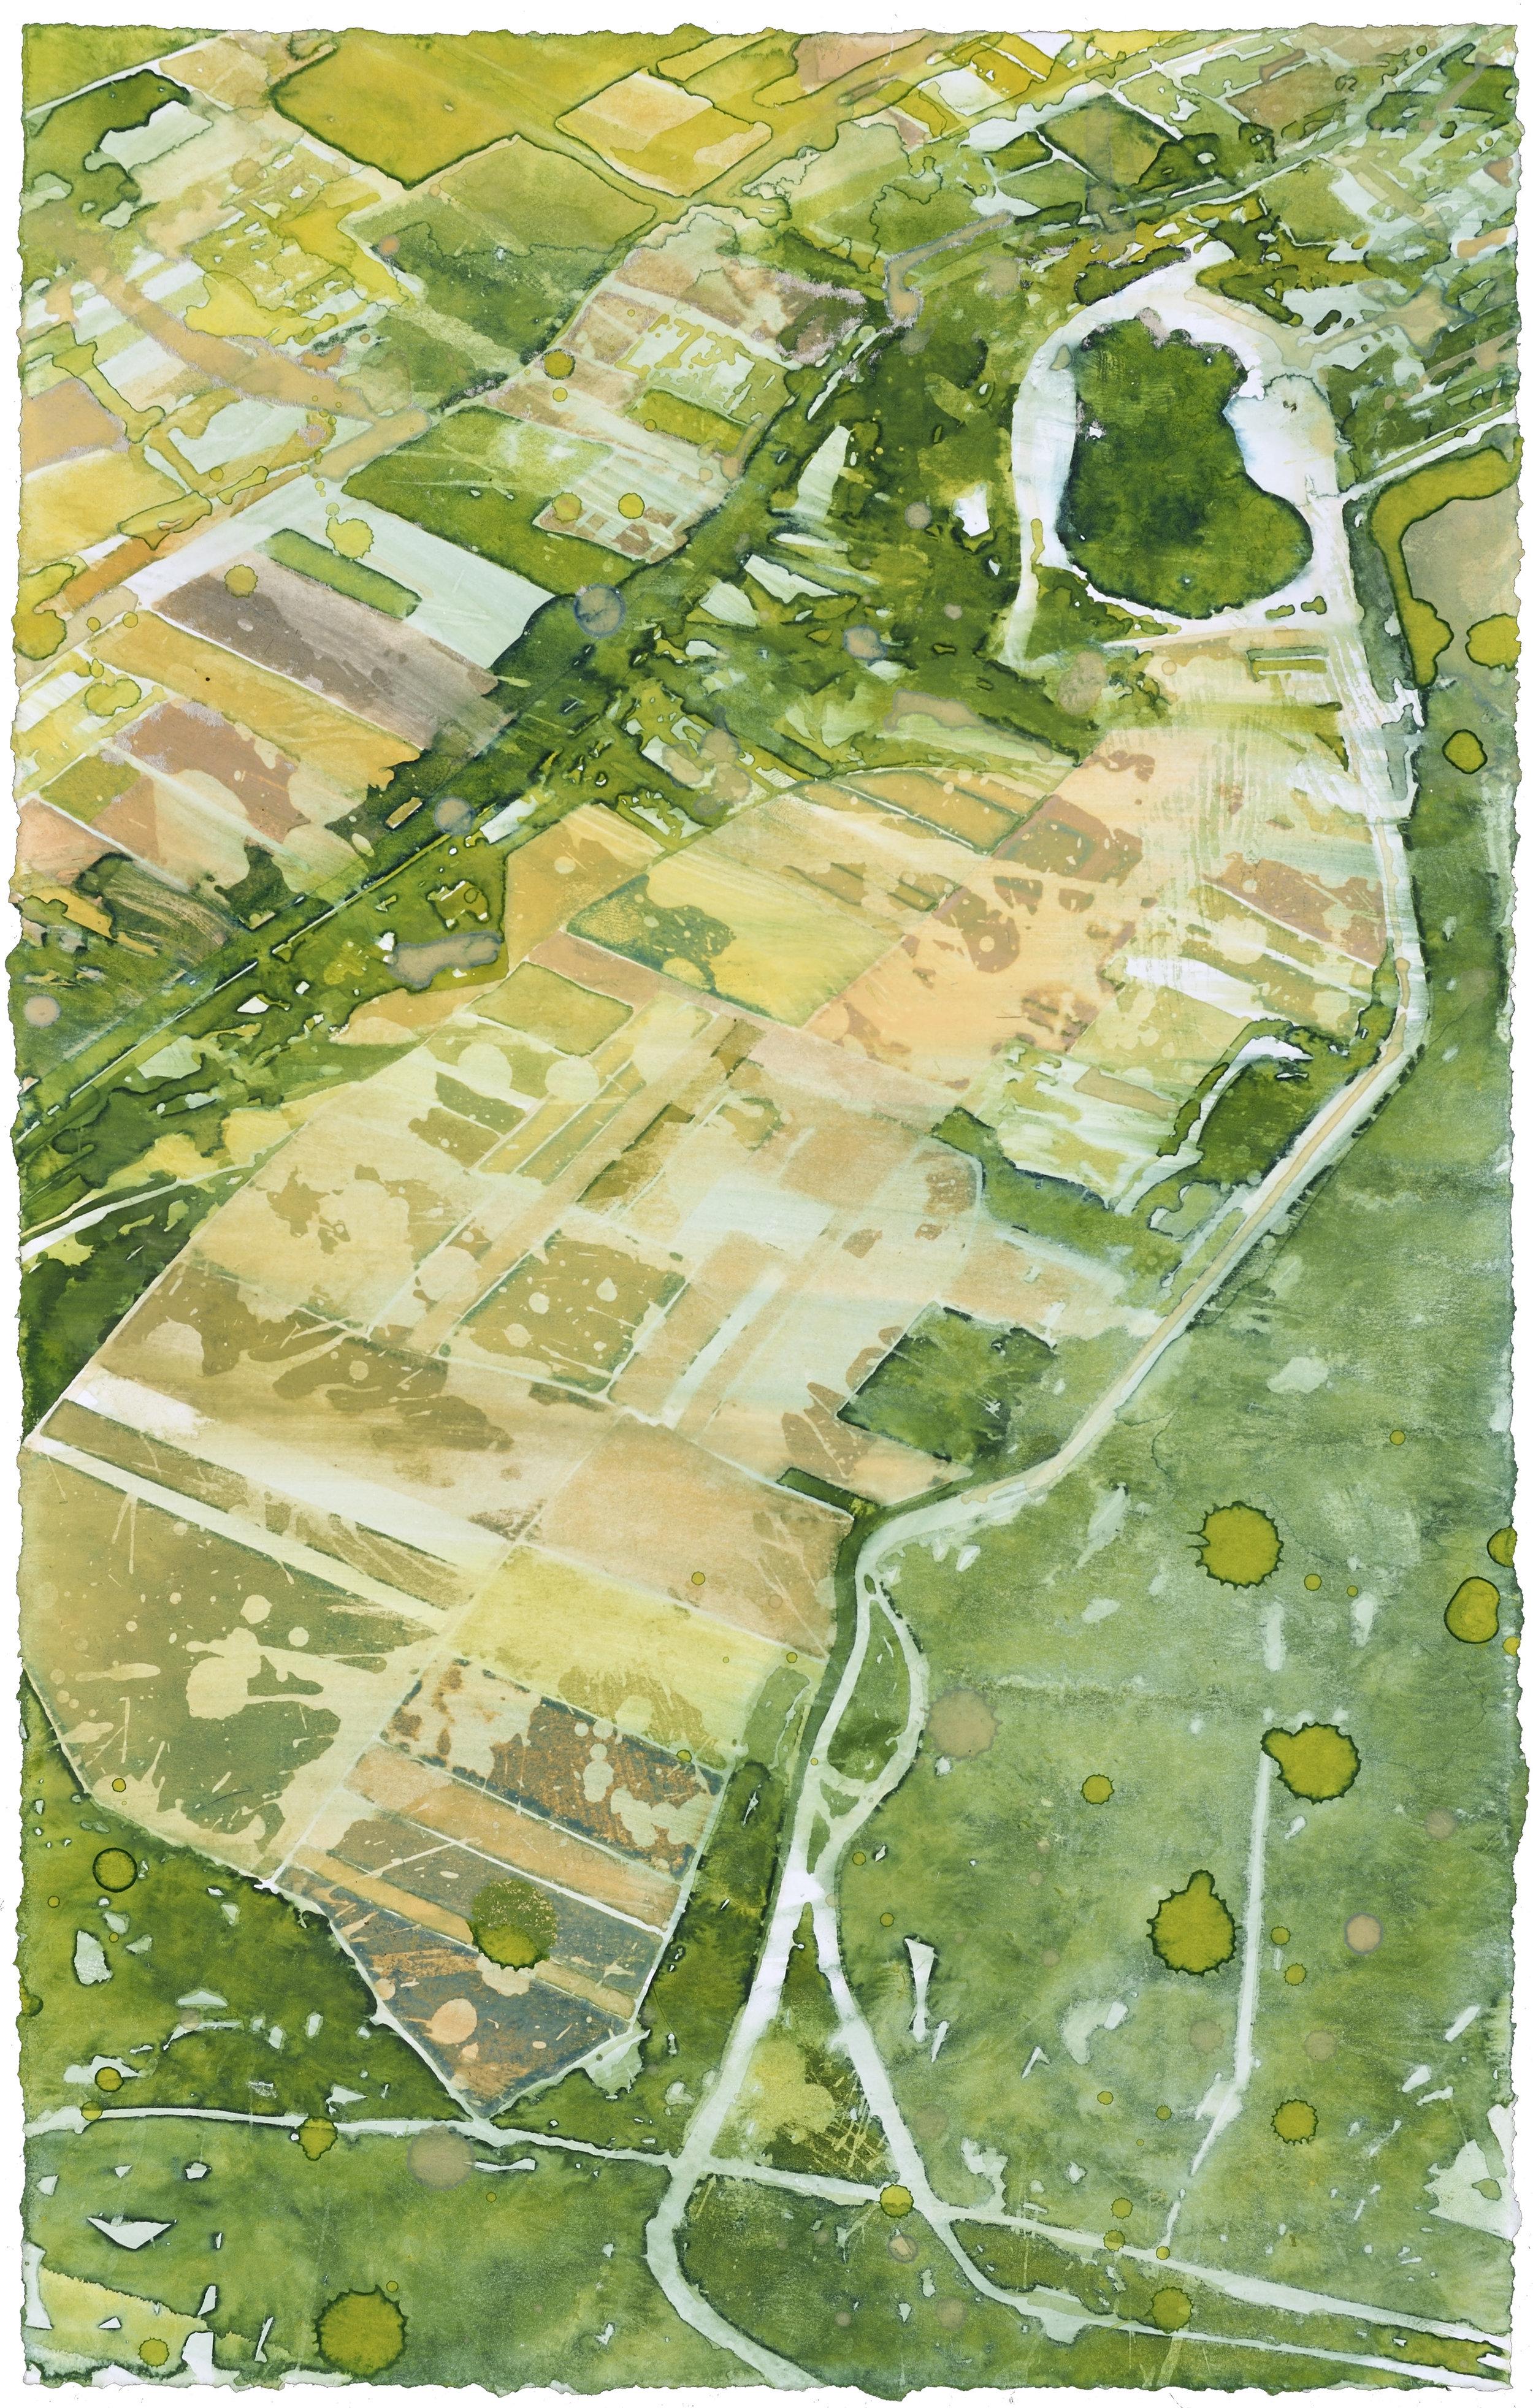 Flight AF 6207, I, watercolor, 48 x 30 cm, 19 x 12 in, 2015